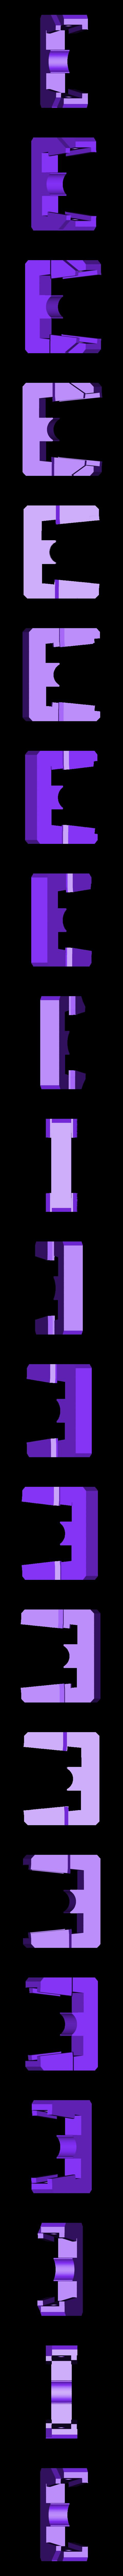 Rotate-Tool04.stl Download free STL file Rotational Stand for Turboprop Engine Cutaway • 3D printer template, konchan77